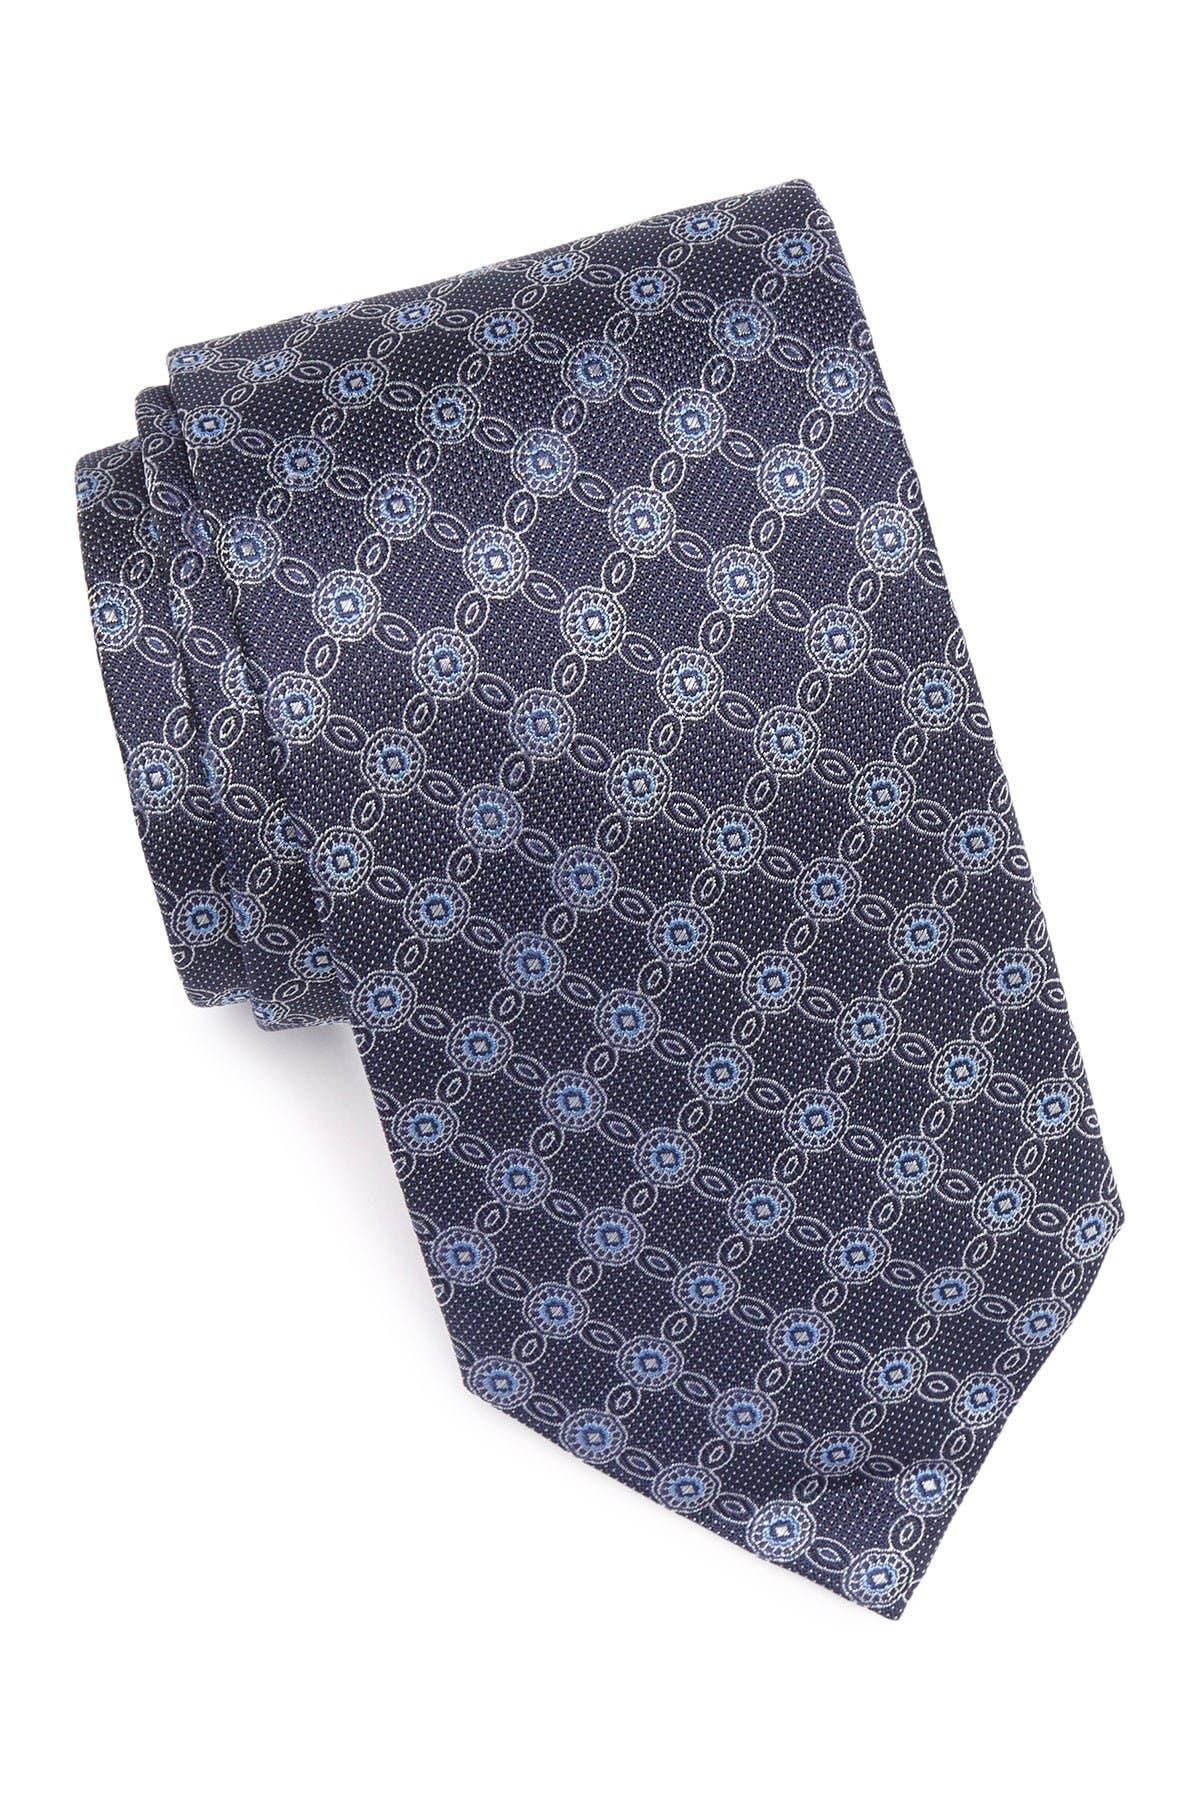 Image of Eton Medallion Print Silk Tie